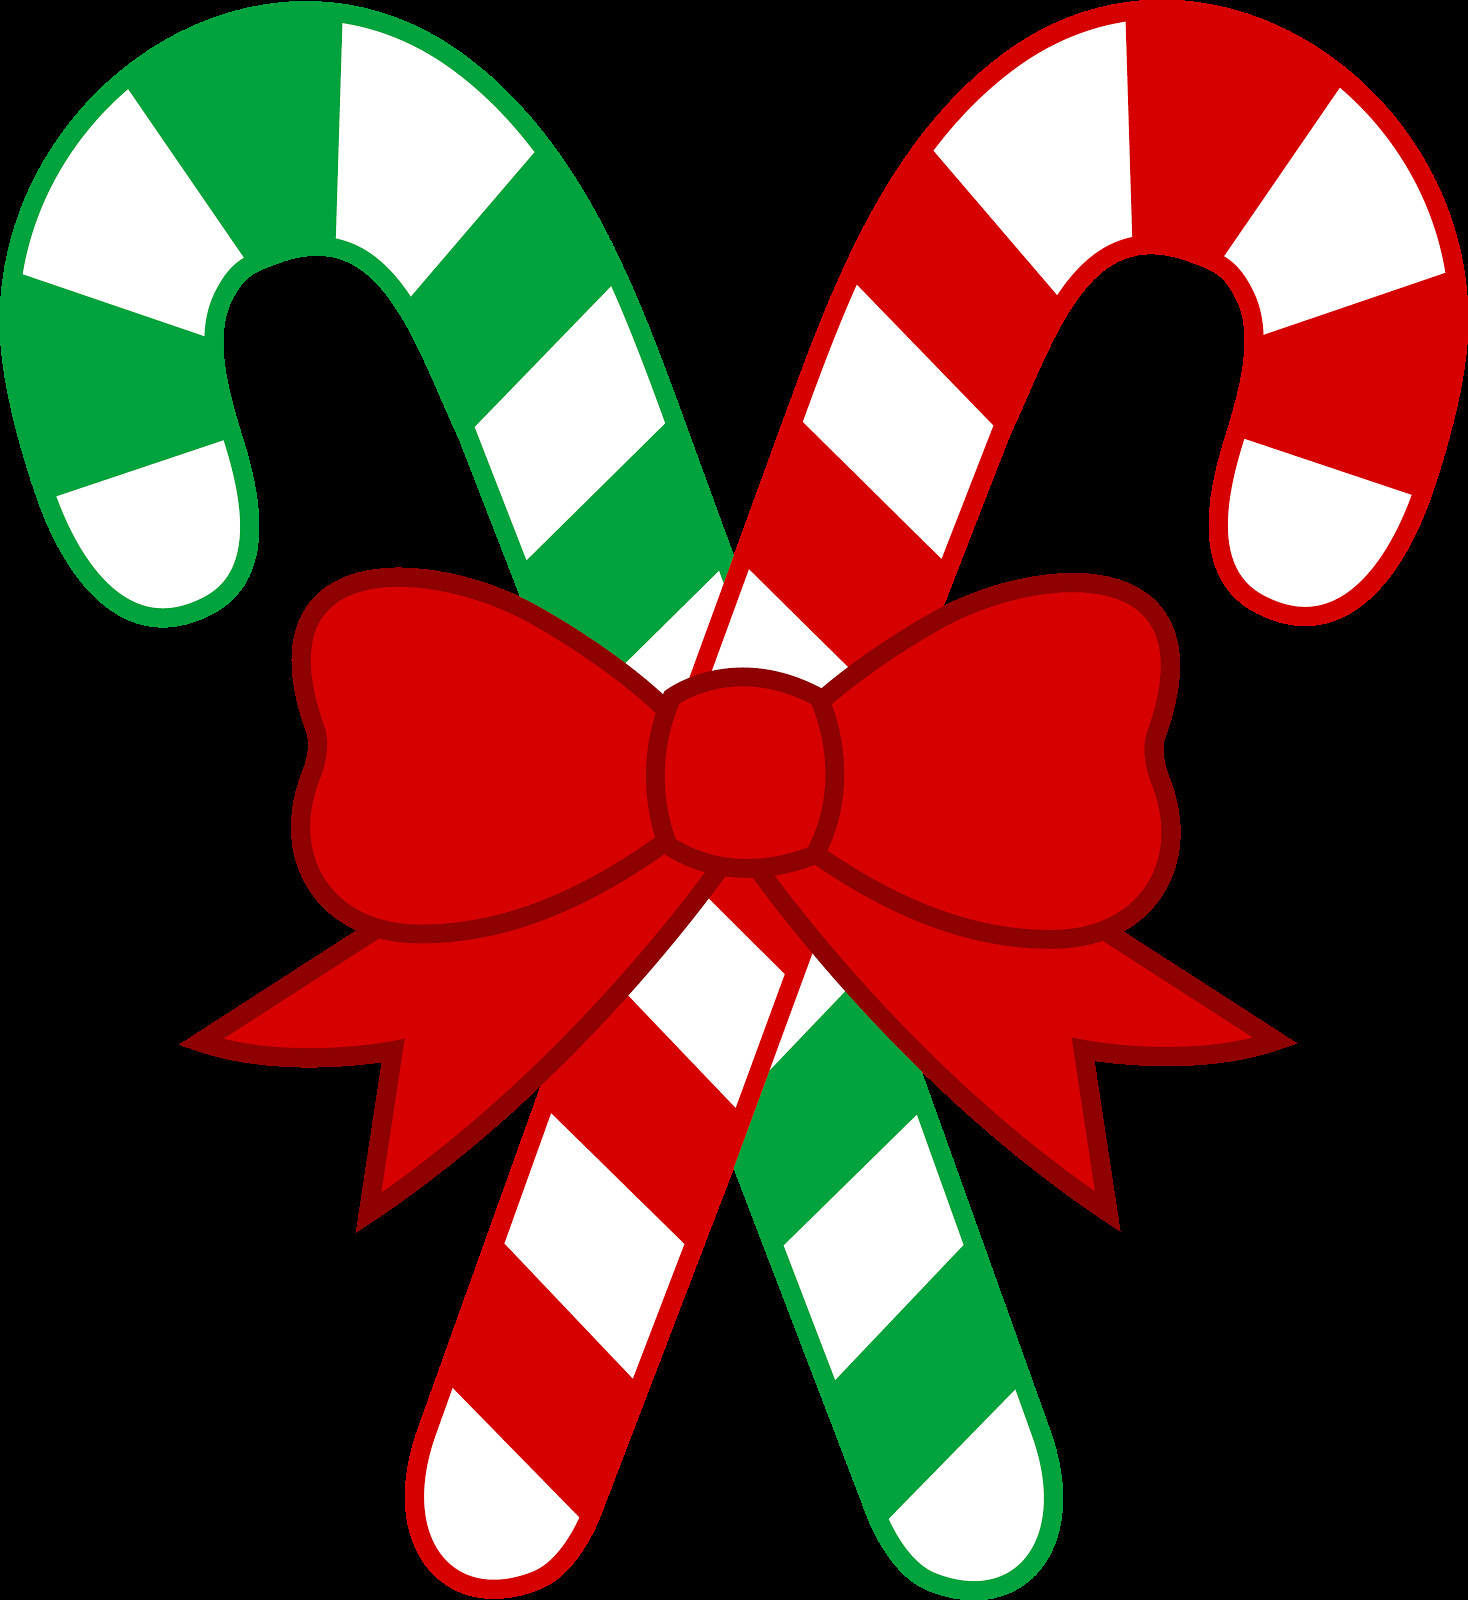 Christmas Candy Cane  Fantastic Dreams of Pamela K Kinney December 2012